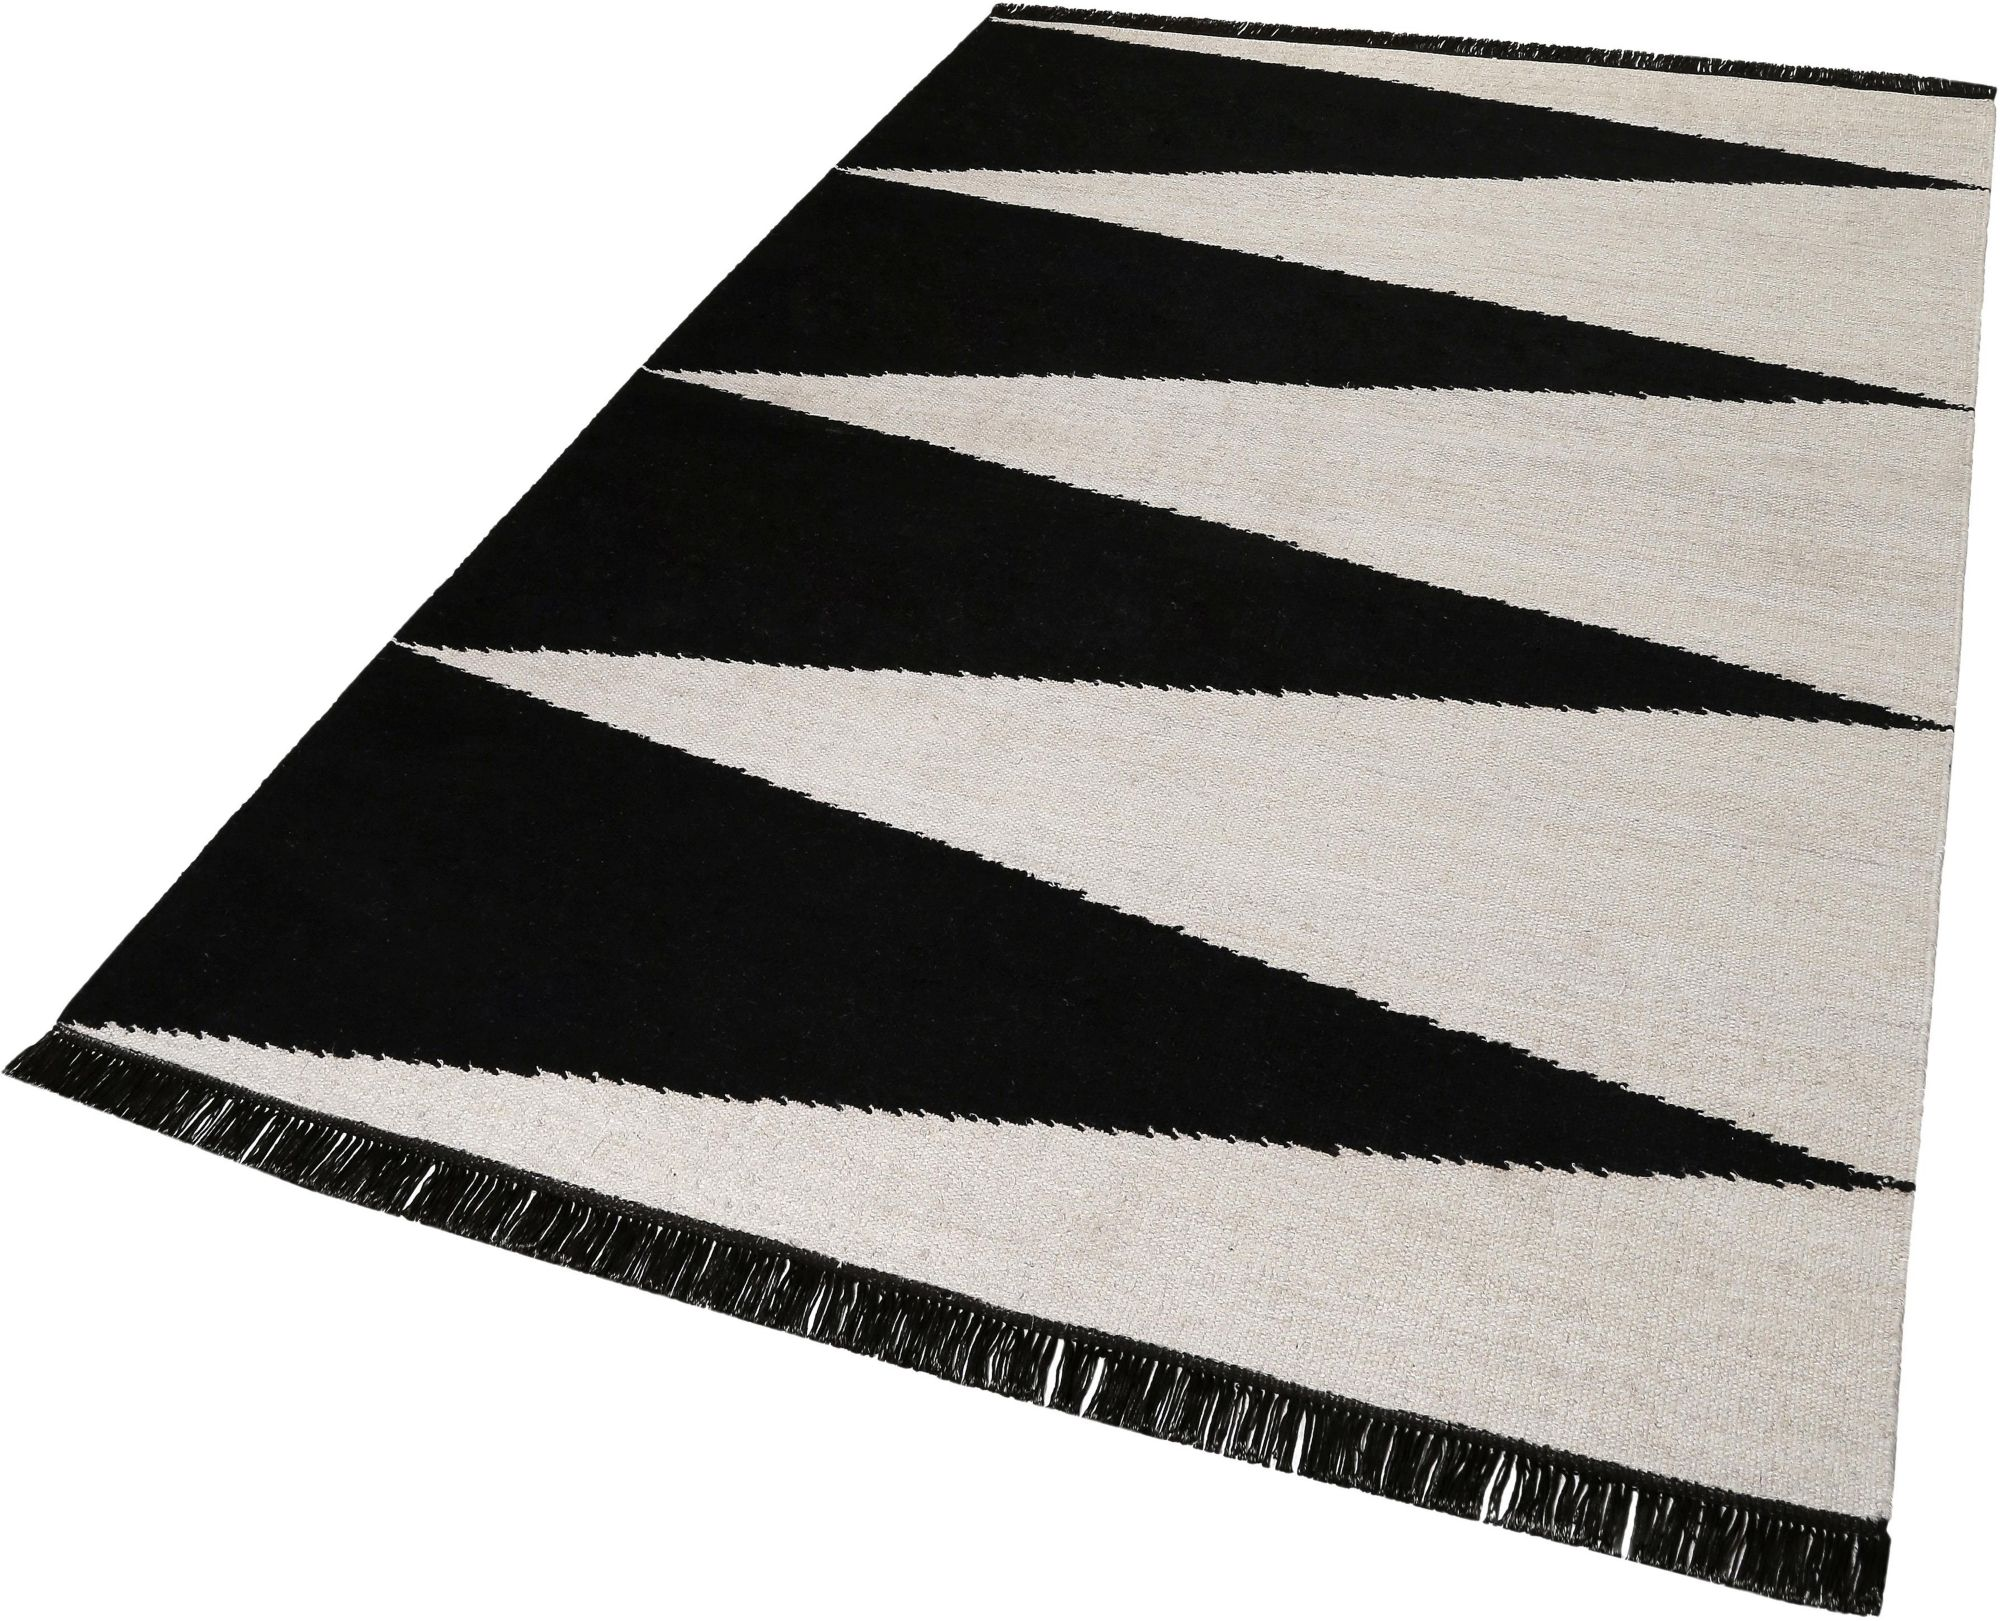 CARPETSCO Teppich, Carpets&Co, »Smart Triangle«, Höhe: 5 mm, handgewebt